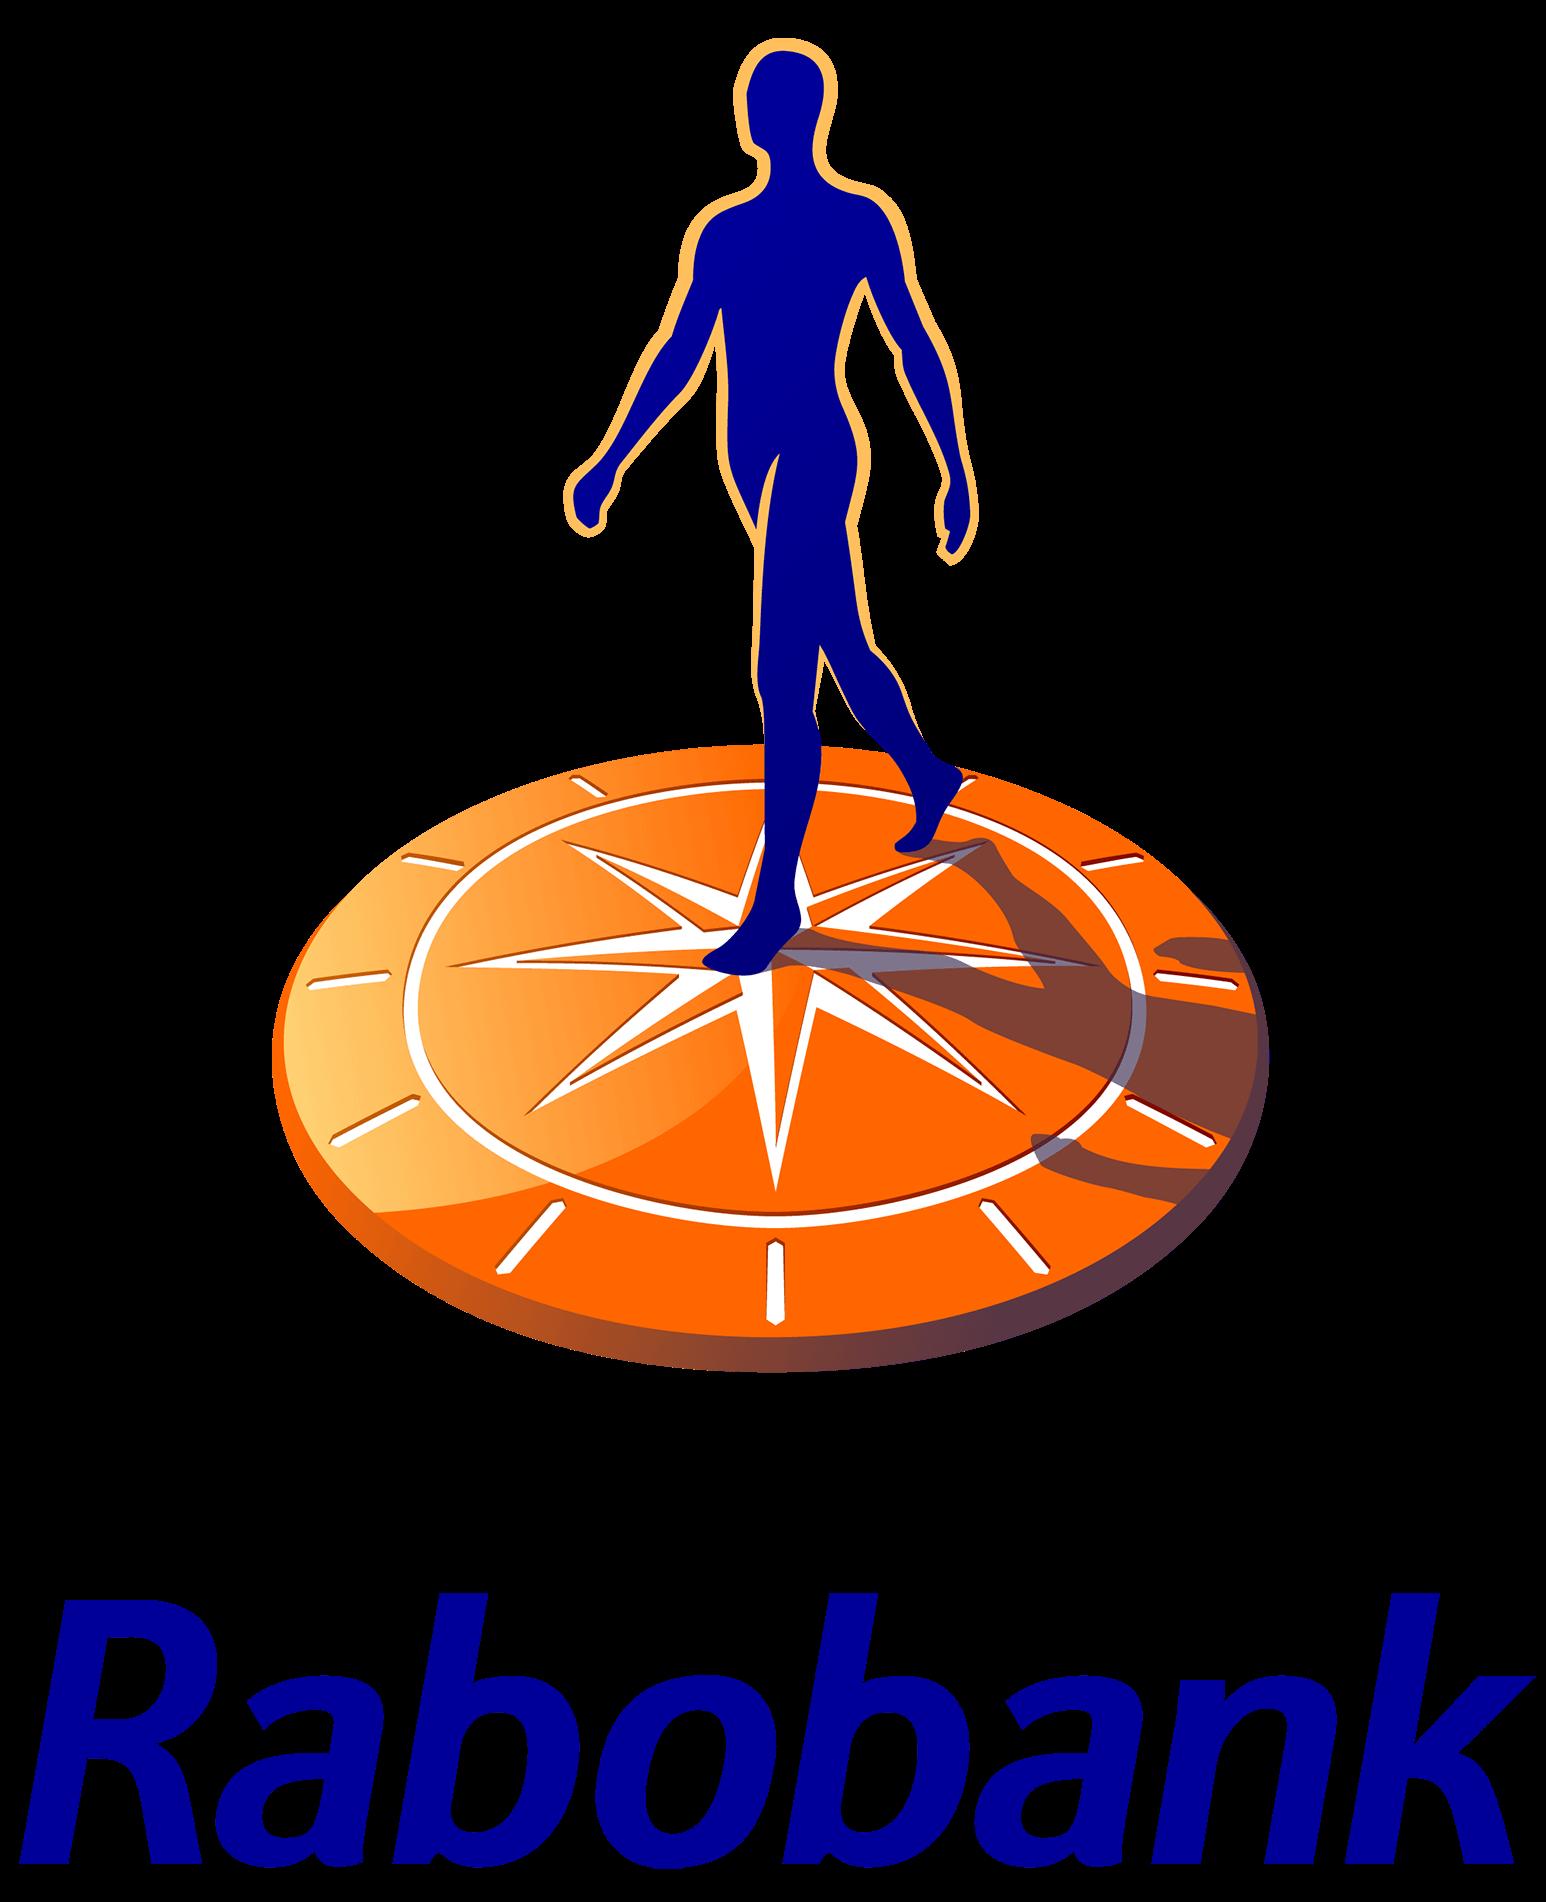 Rabobank klantcase